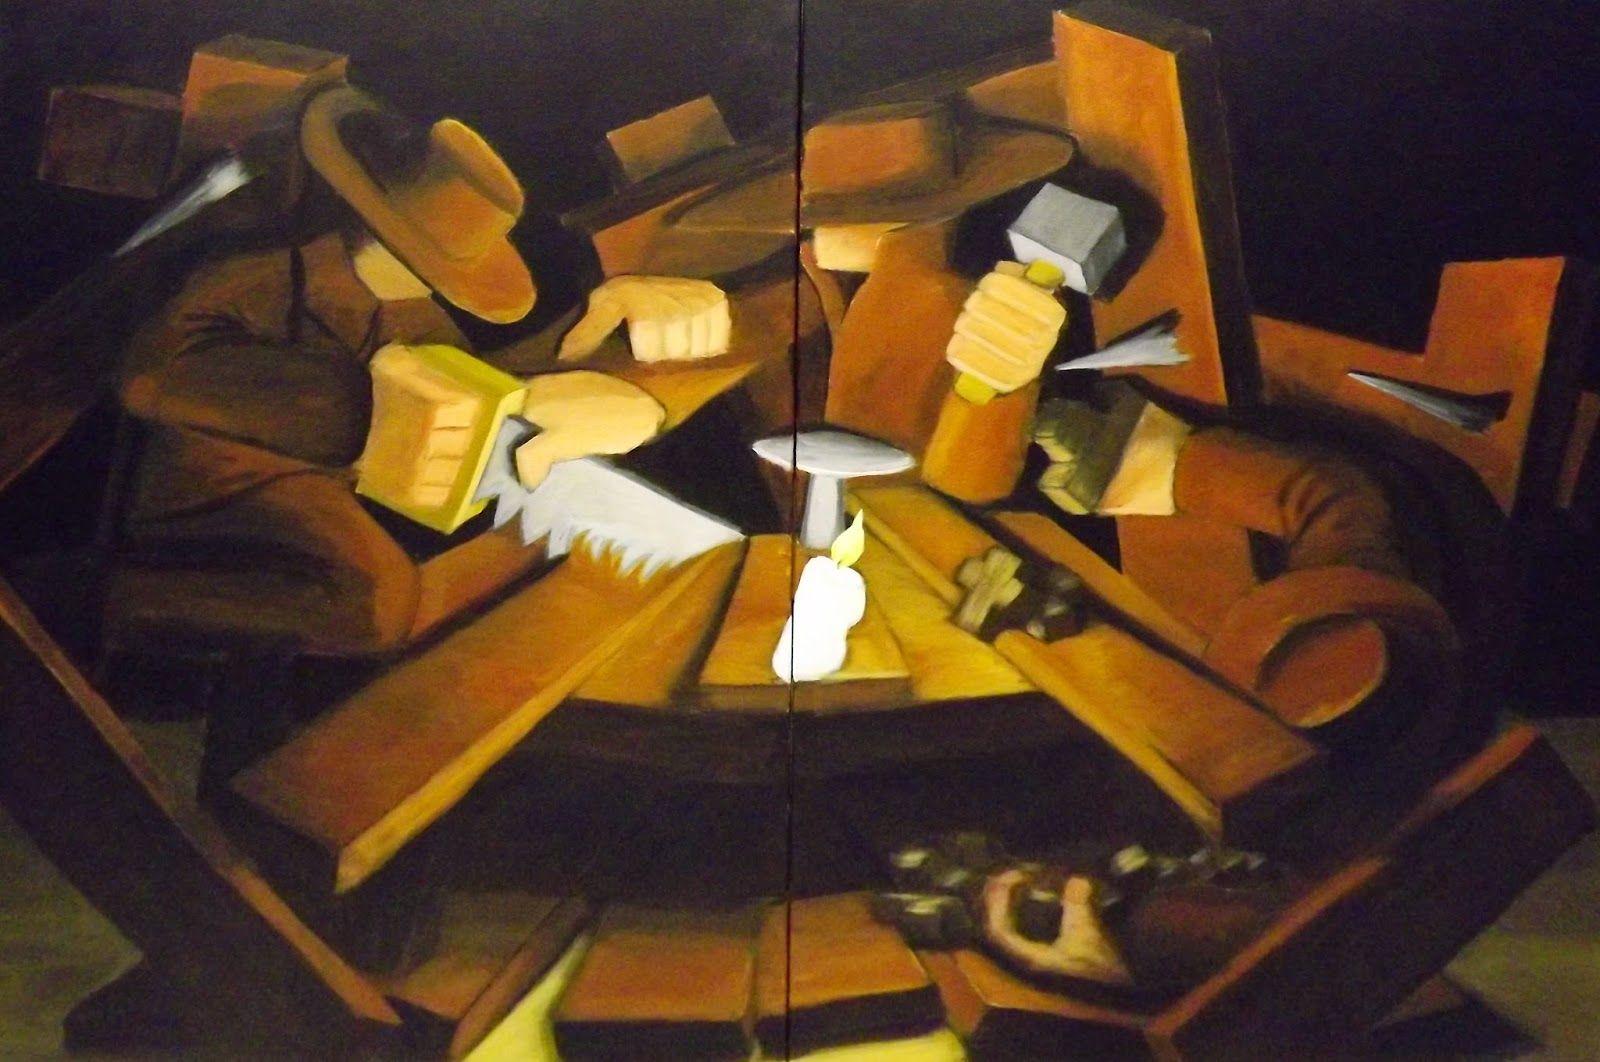 art-of-shadowsBlog: Warum nicht Hänsel?